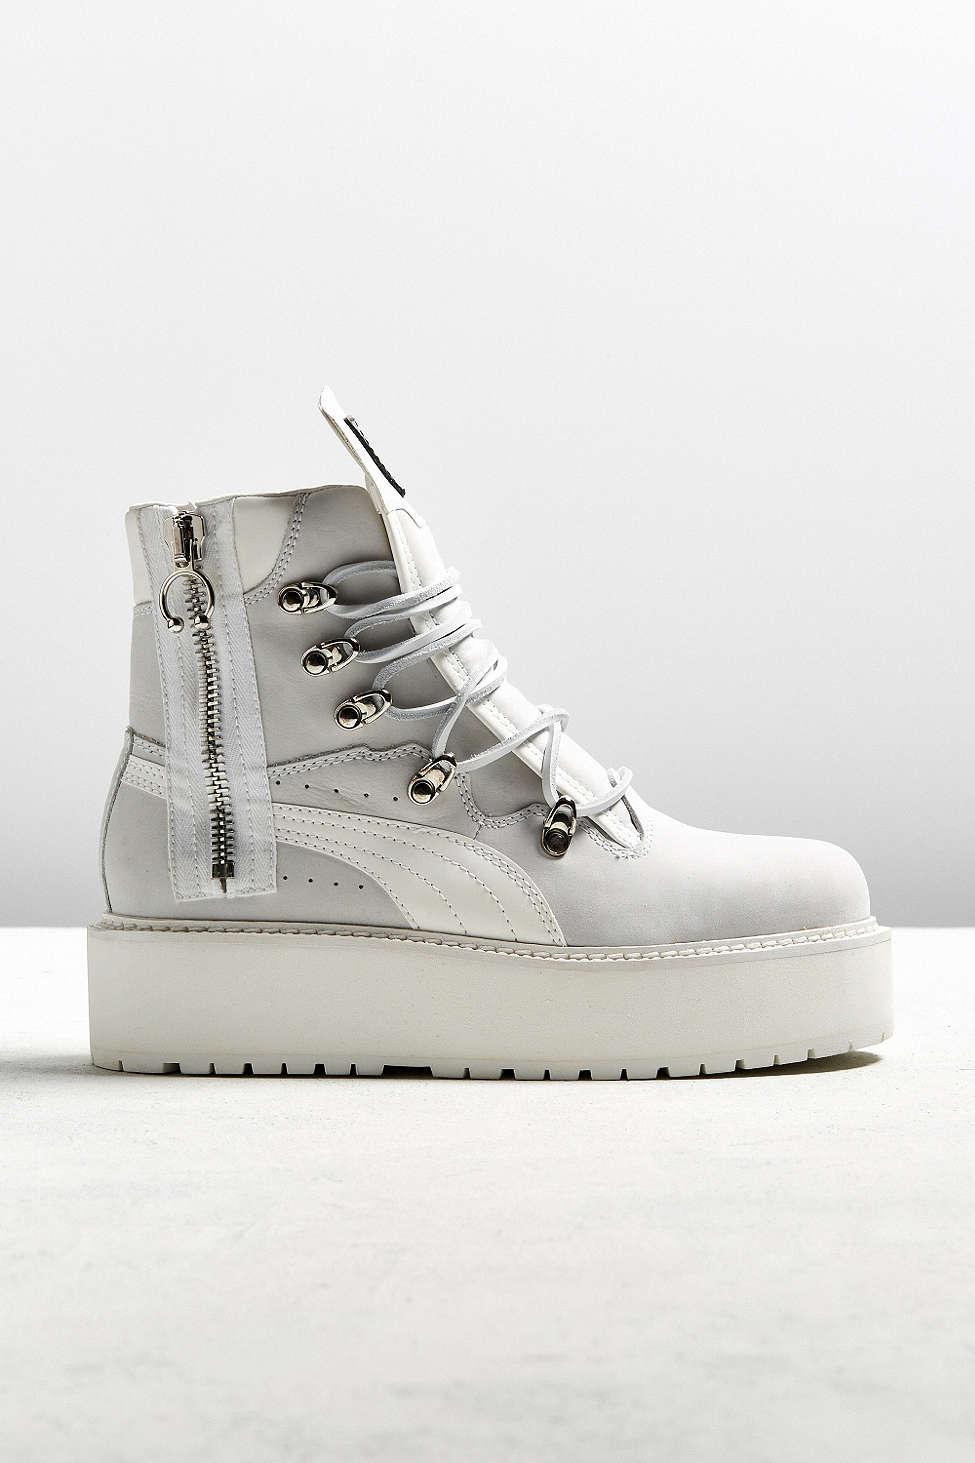 Lyst - PUMA Fenty By Rihanna Sneakerboot in White dfcb19879